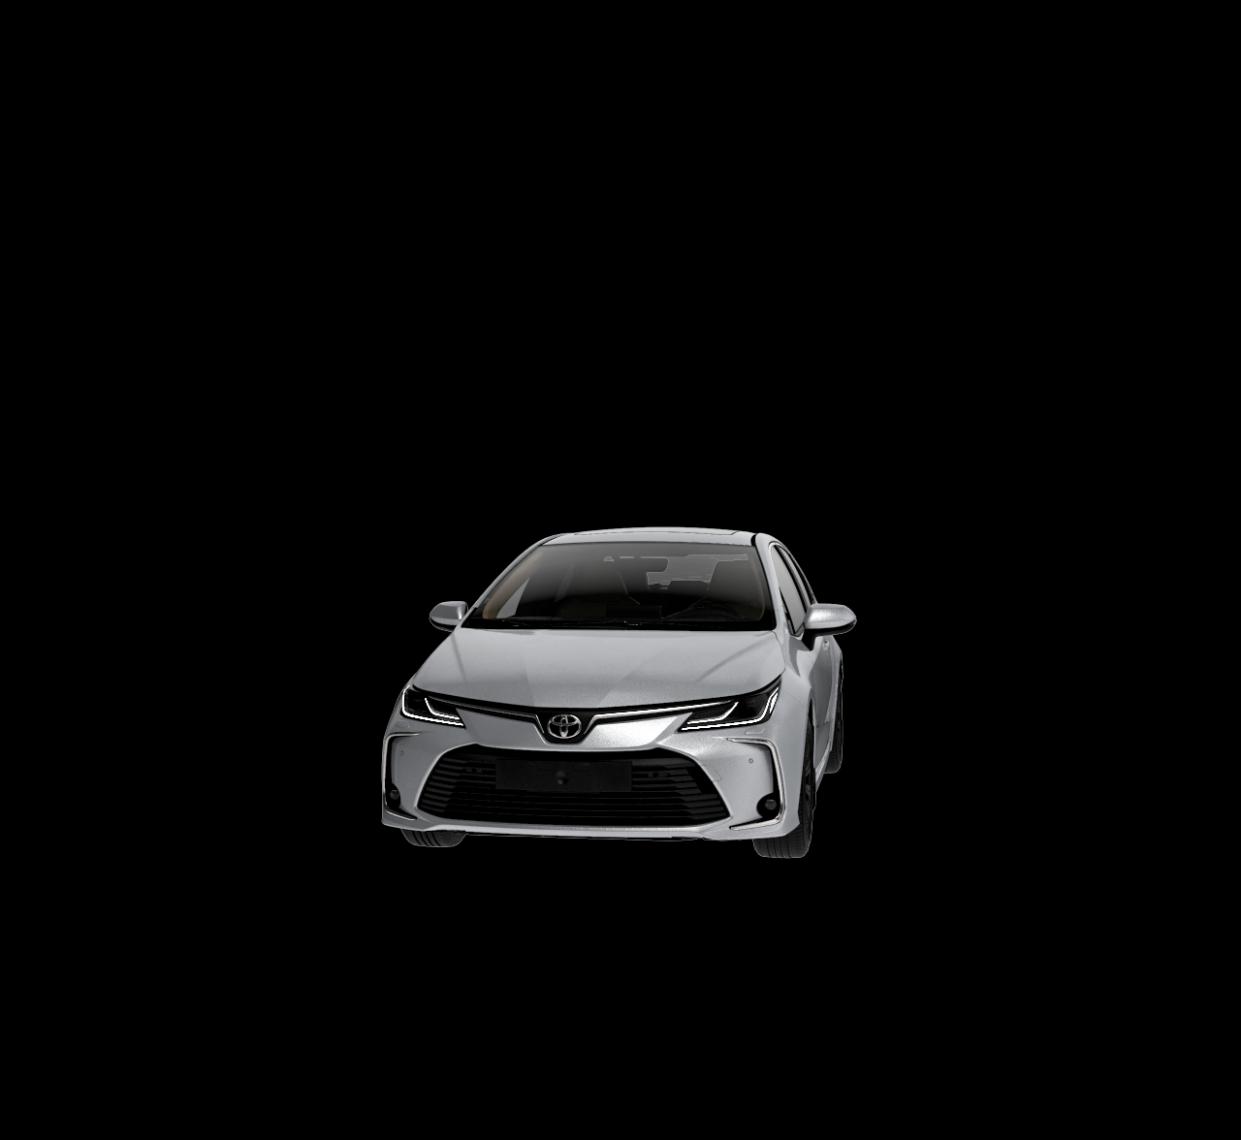 Concept Toyota Egypt Corolla 2022